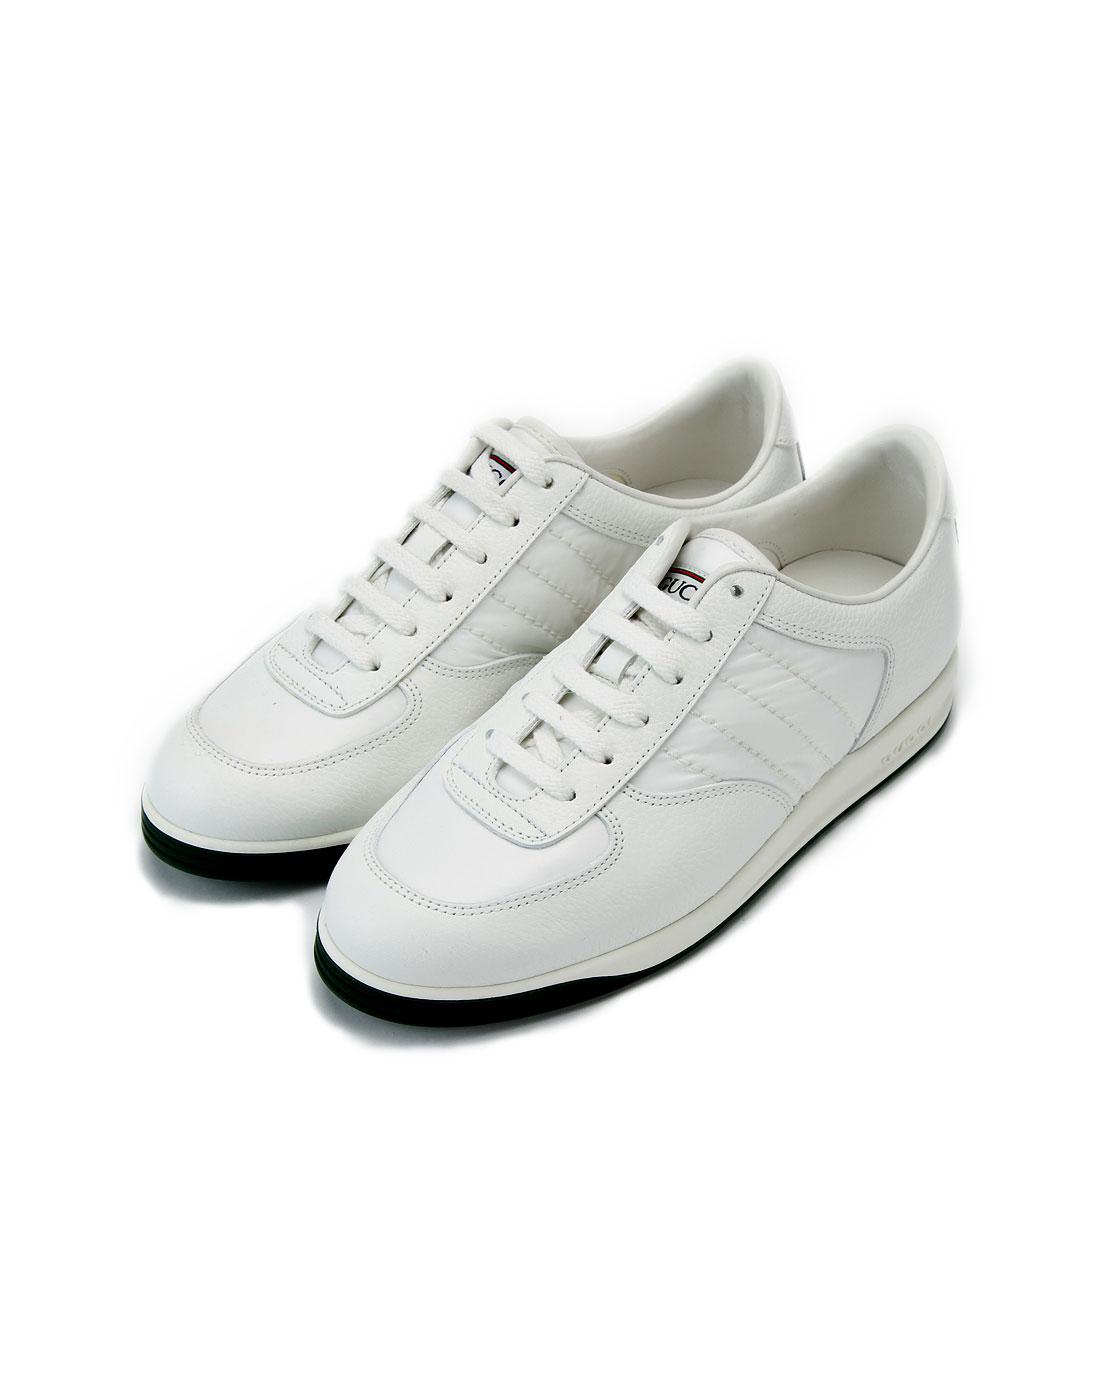 gucci鞋子专场女款纯白色绑带板鞋